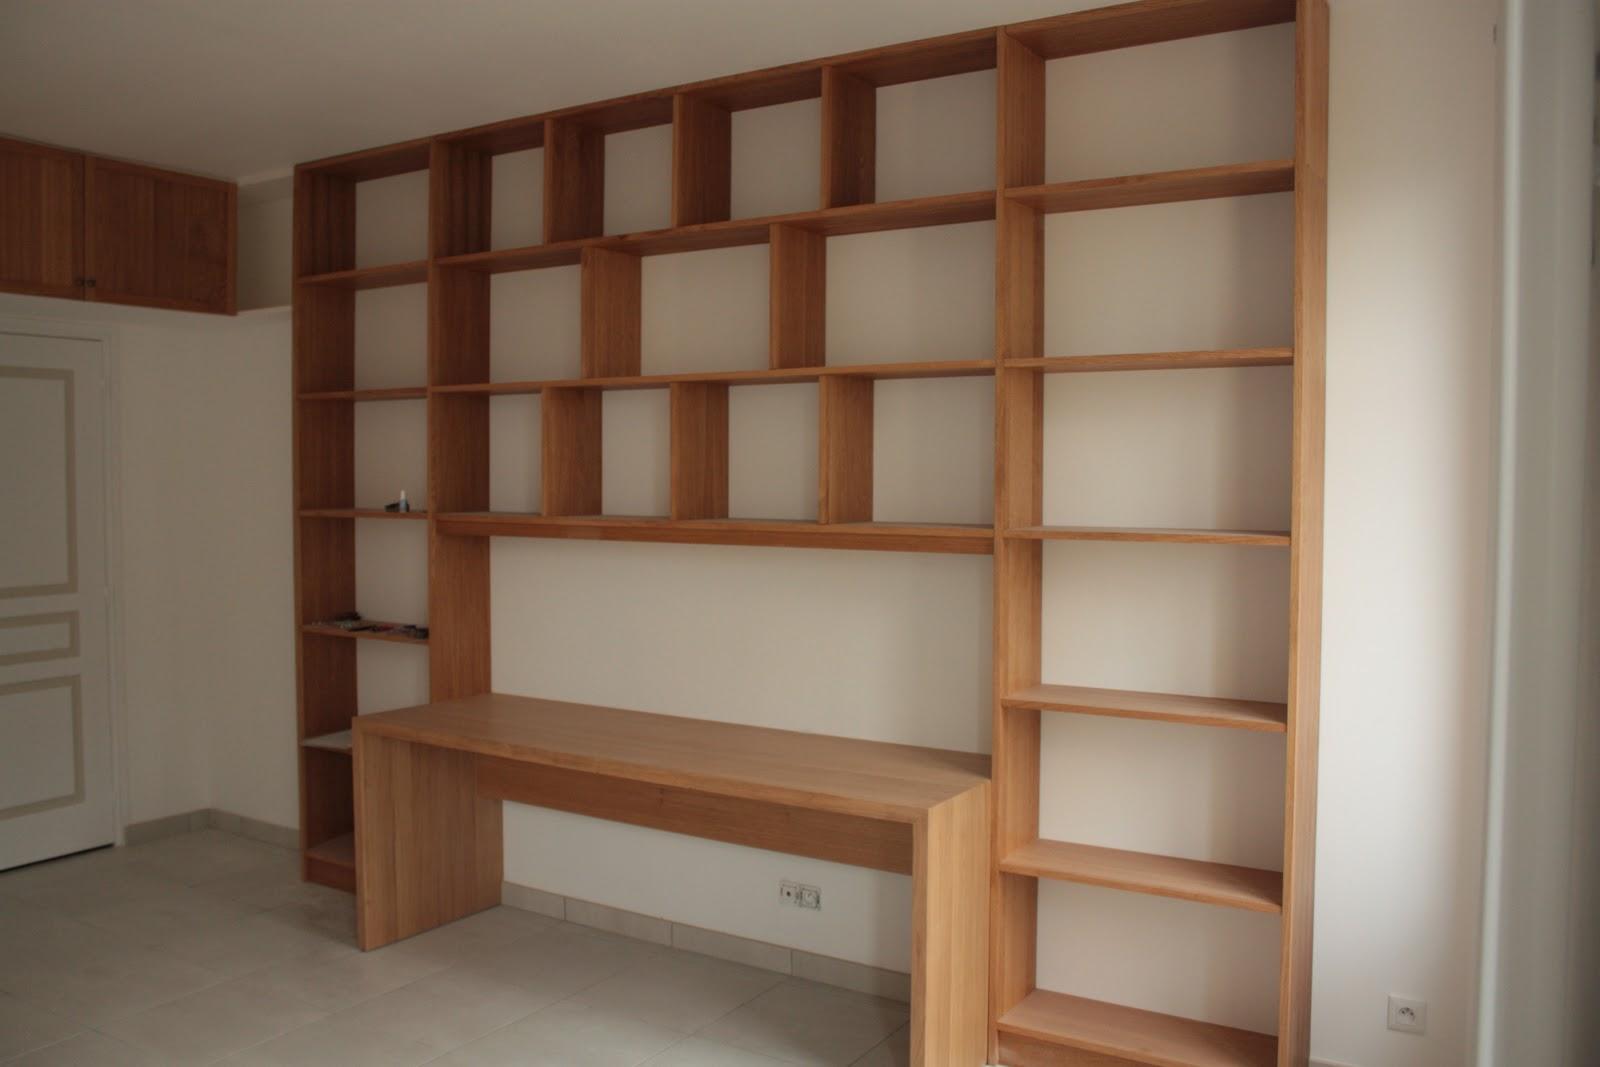 racines meubles et agencements. Black Bedroom Furniture Sets. Home Design Ideas